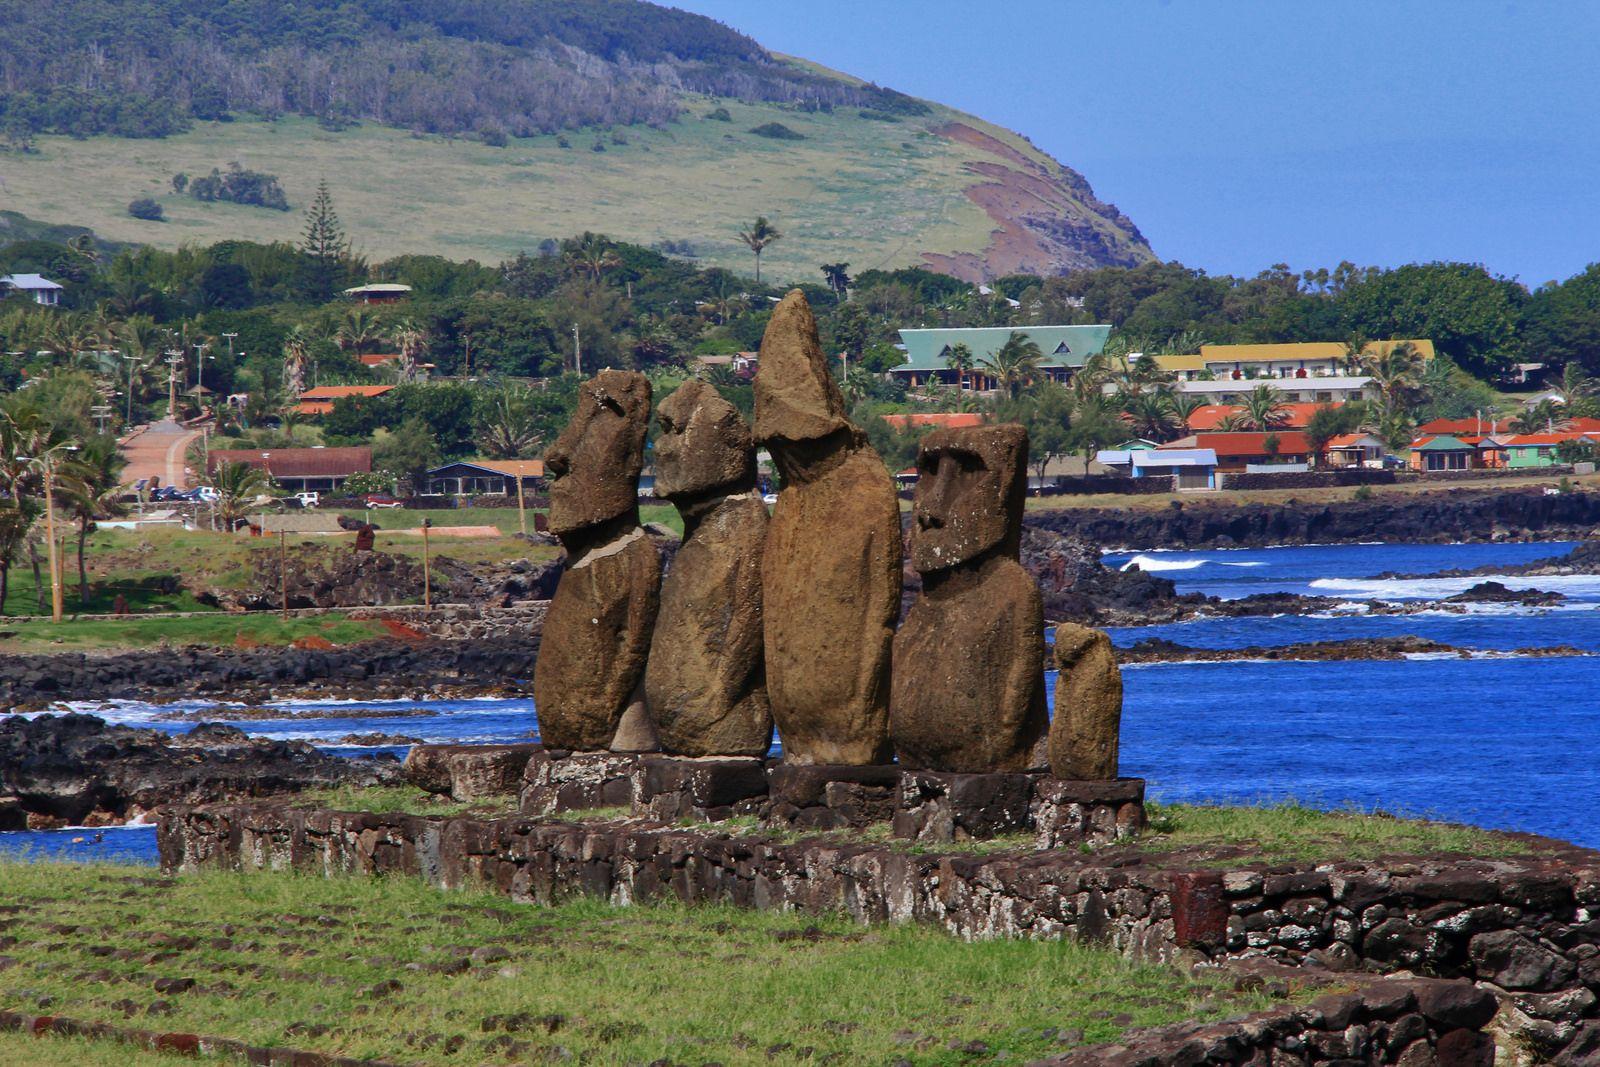 Ahu Tahai / Hanga Roa (Isla de Pascua) | Isla de pascua, Imagenes del  mundo, Islas